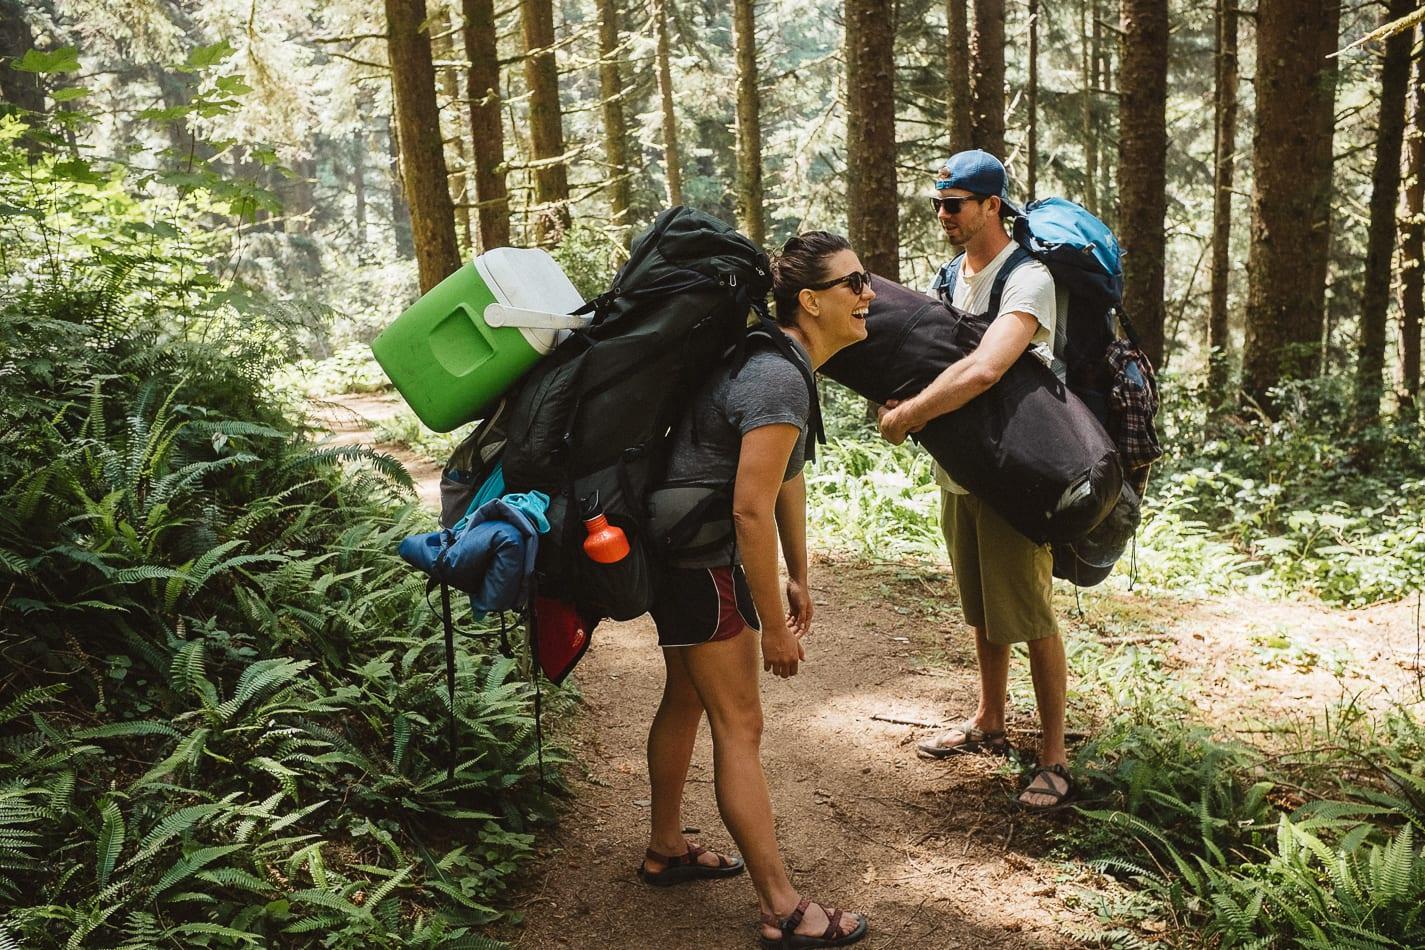 patricks-point-beach-camping-california-adventure-photographer-30